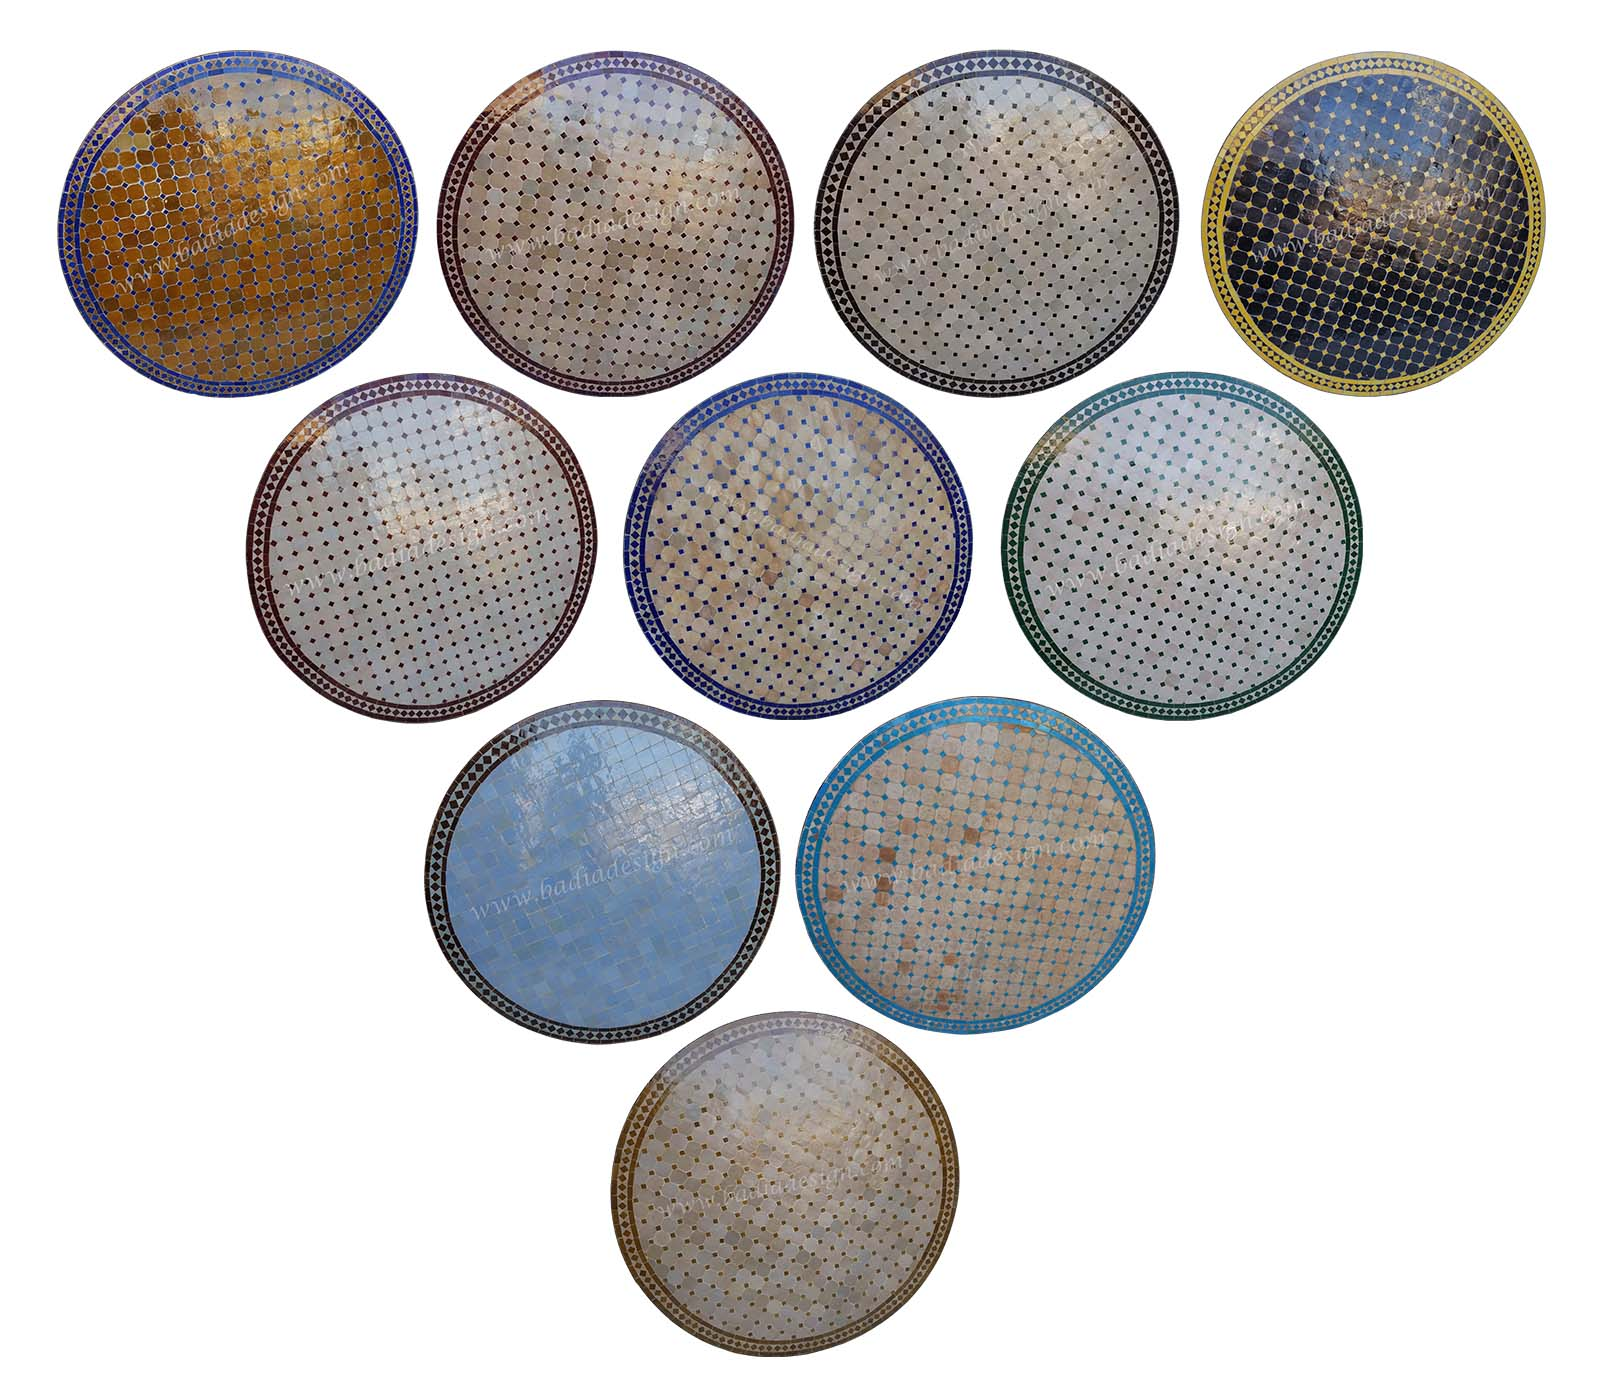 ceramic-tile-table-top-mtr417.jpg